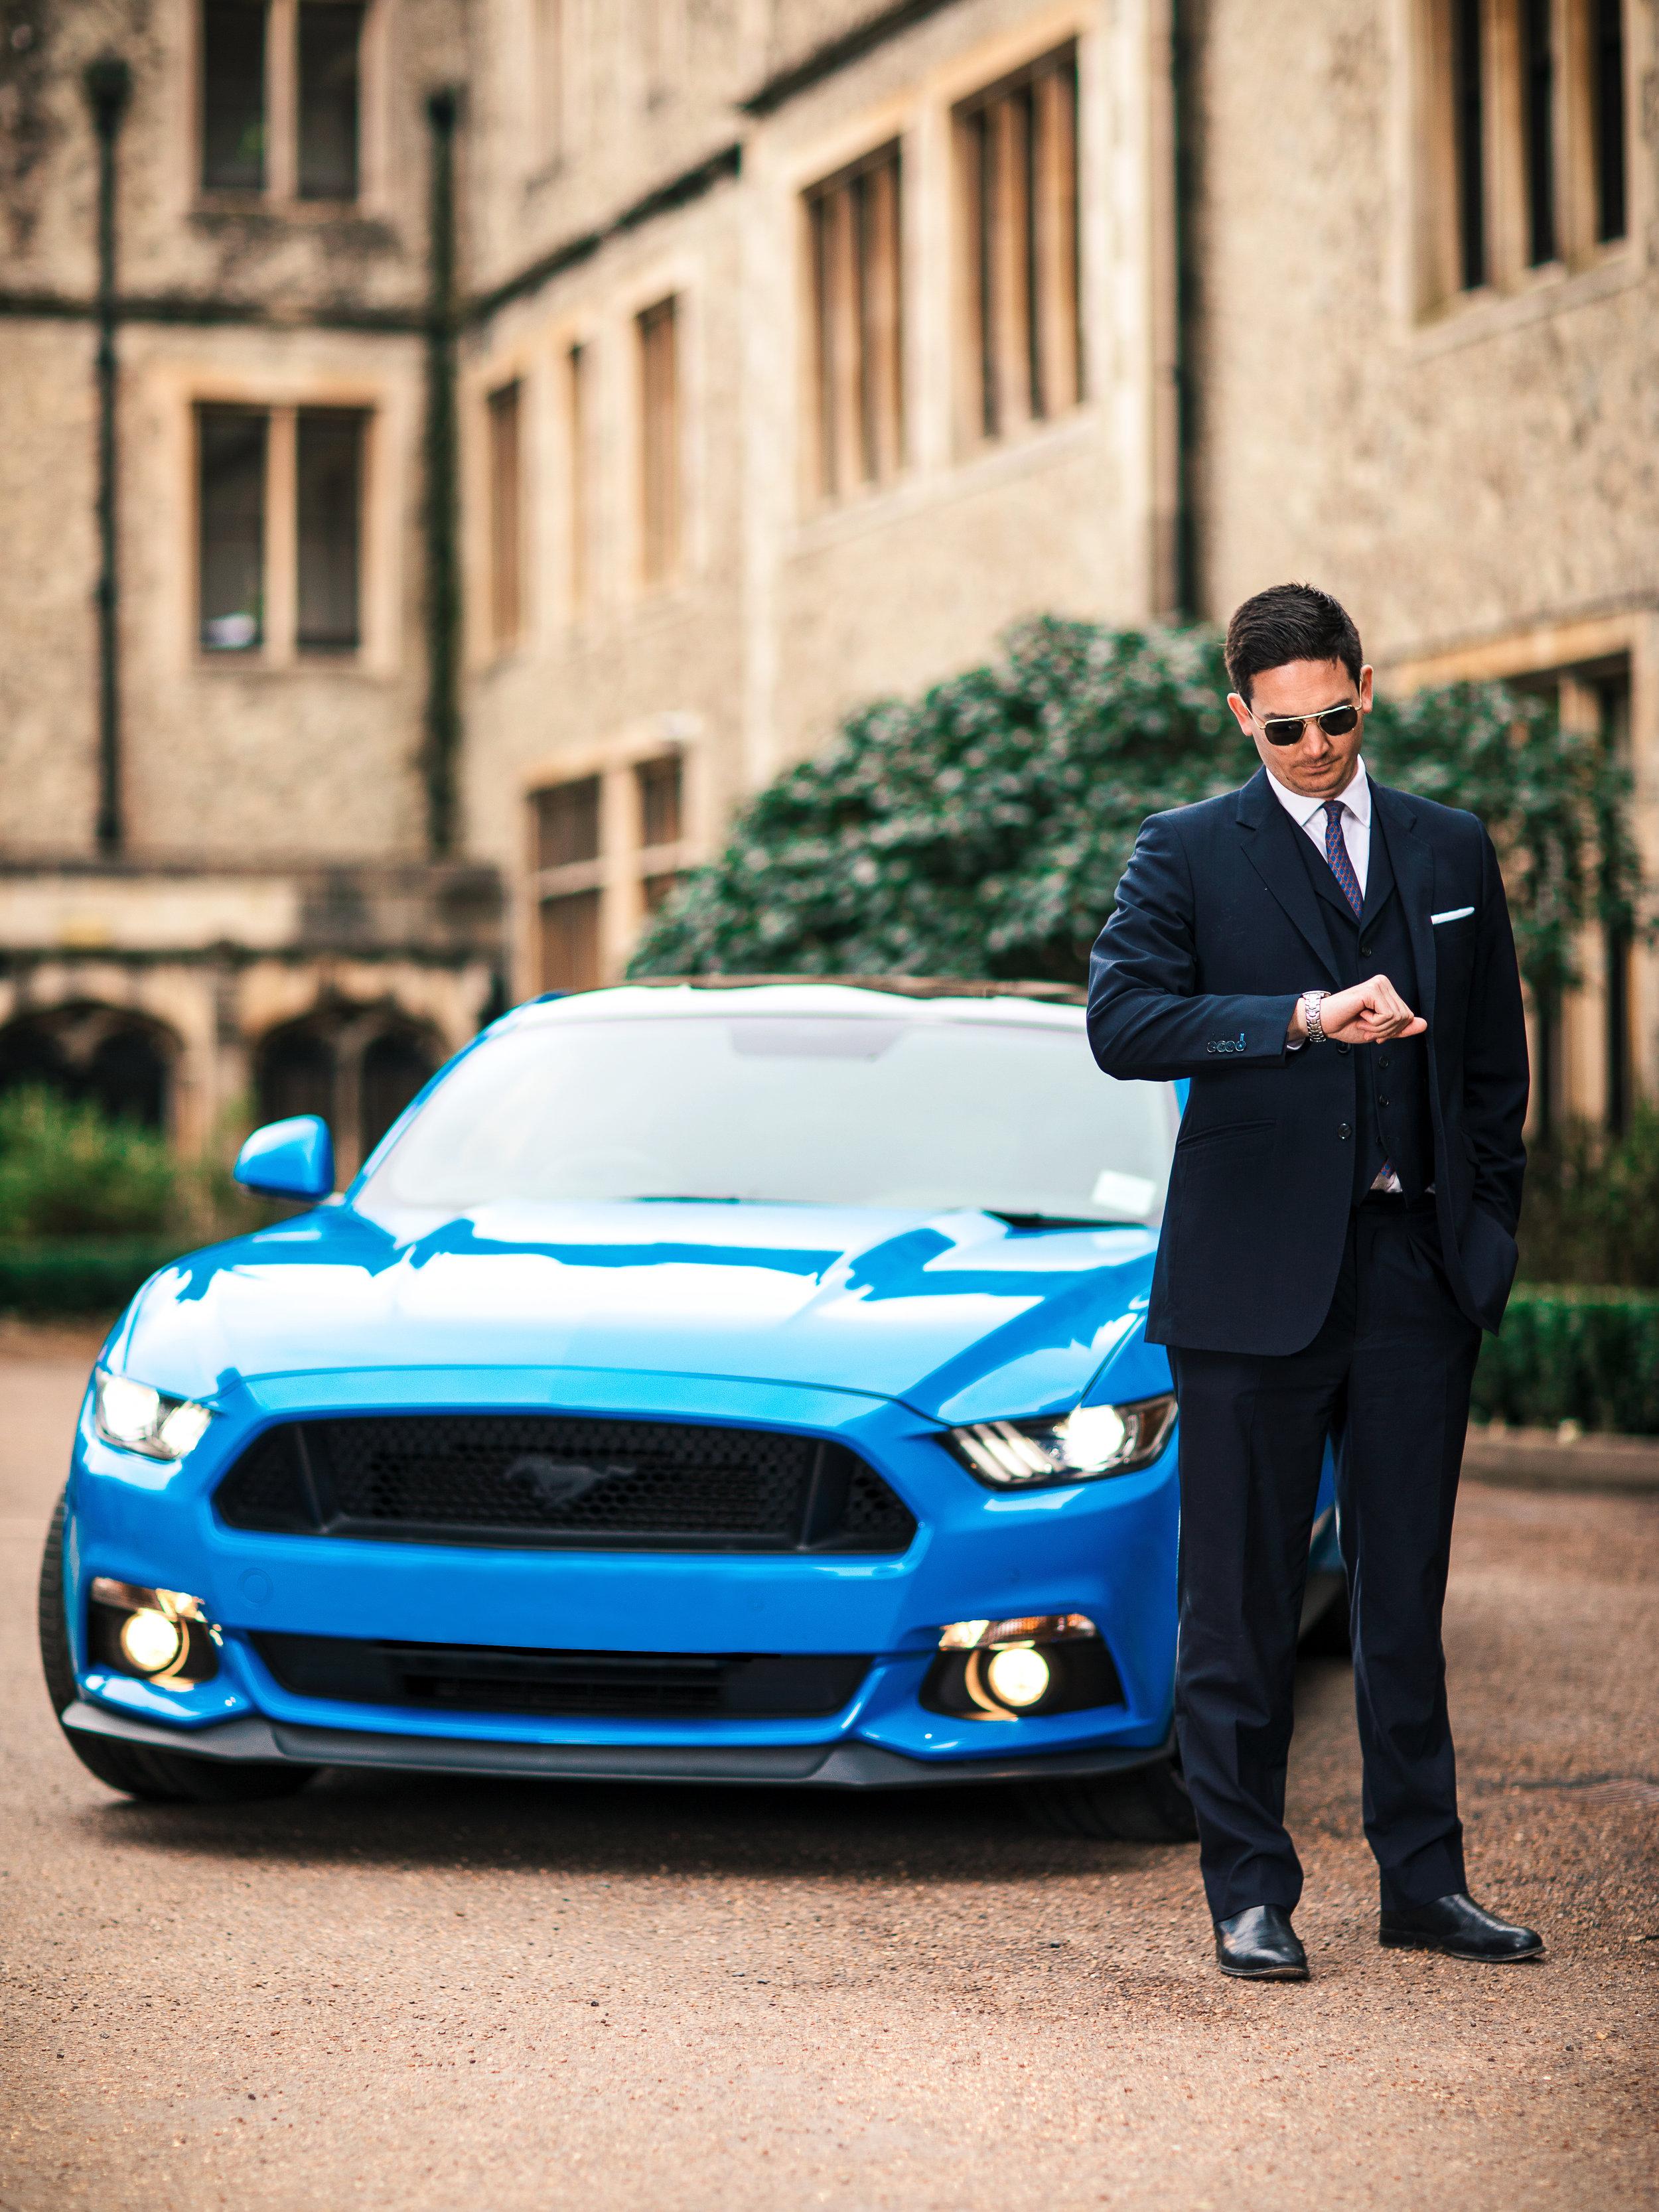 Checking the Time - Modern Male Fashion Portrait